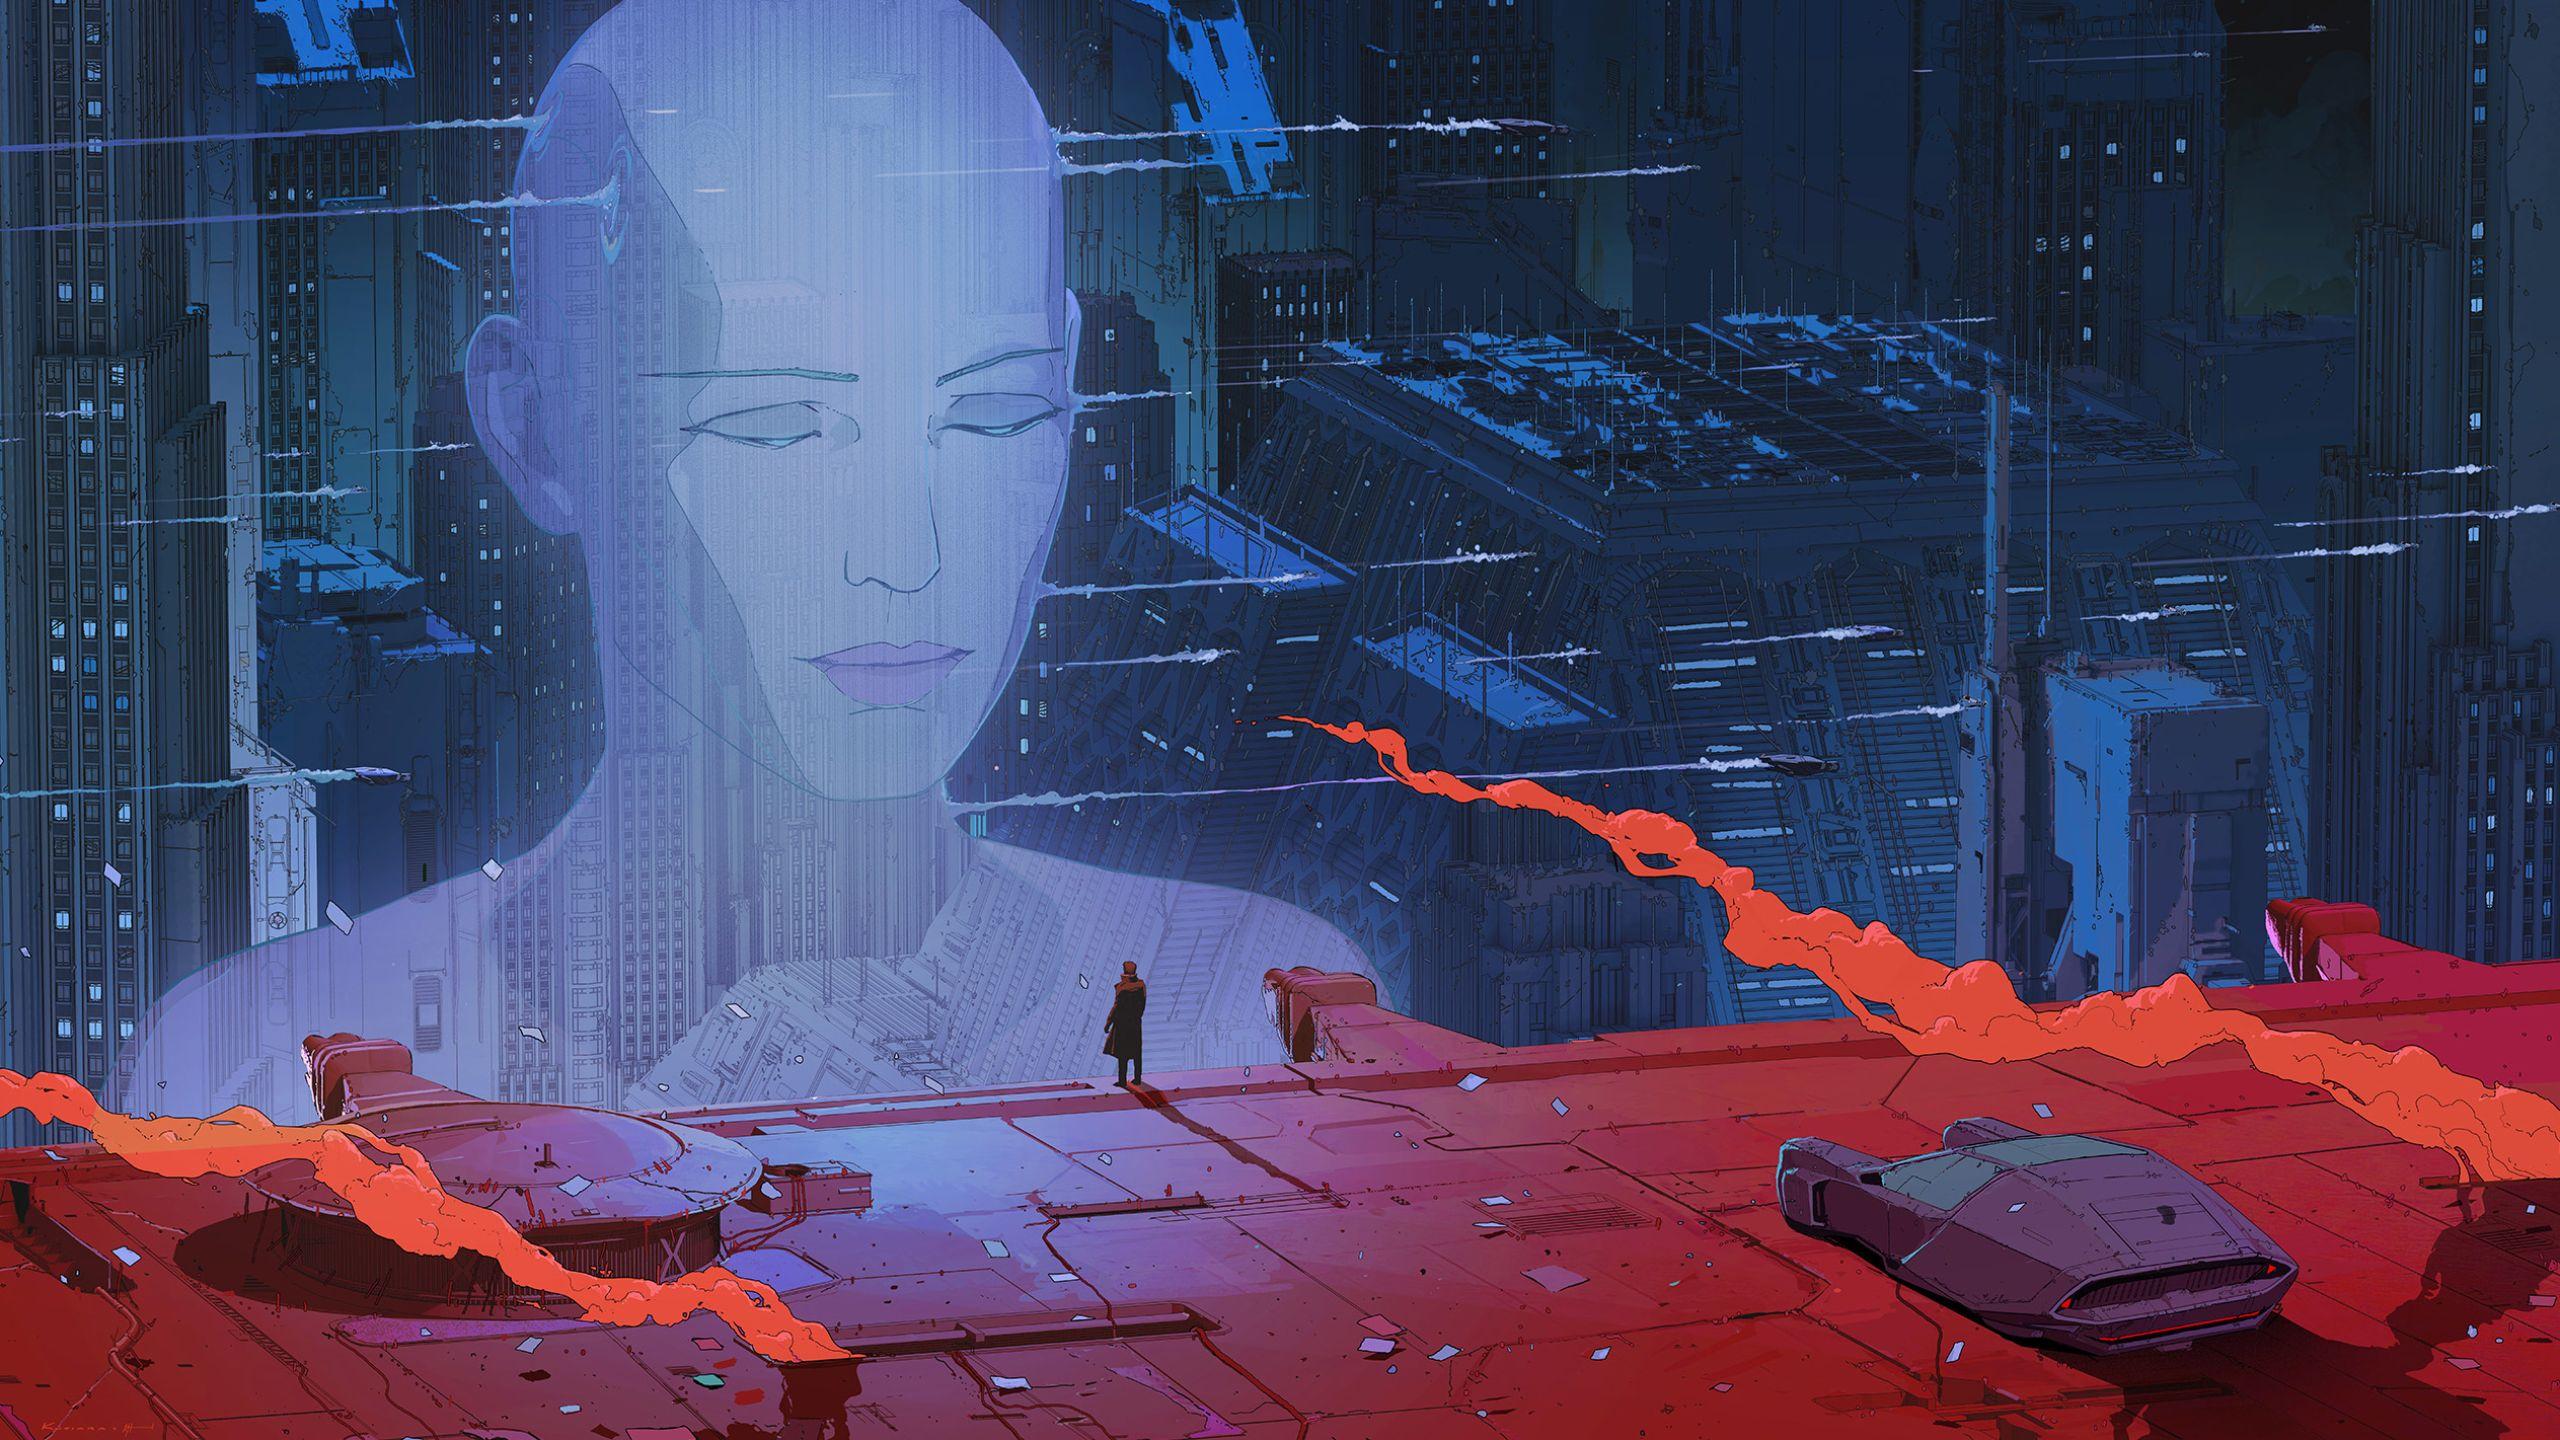 Blade Runner 2049 2560x1440 Music Indieartist Chicago Blade Runner Blade Runner Art Ash Thorp